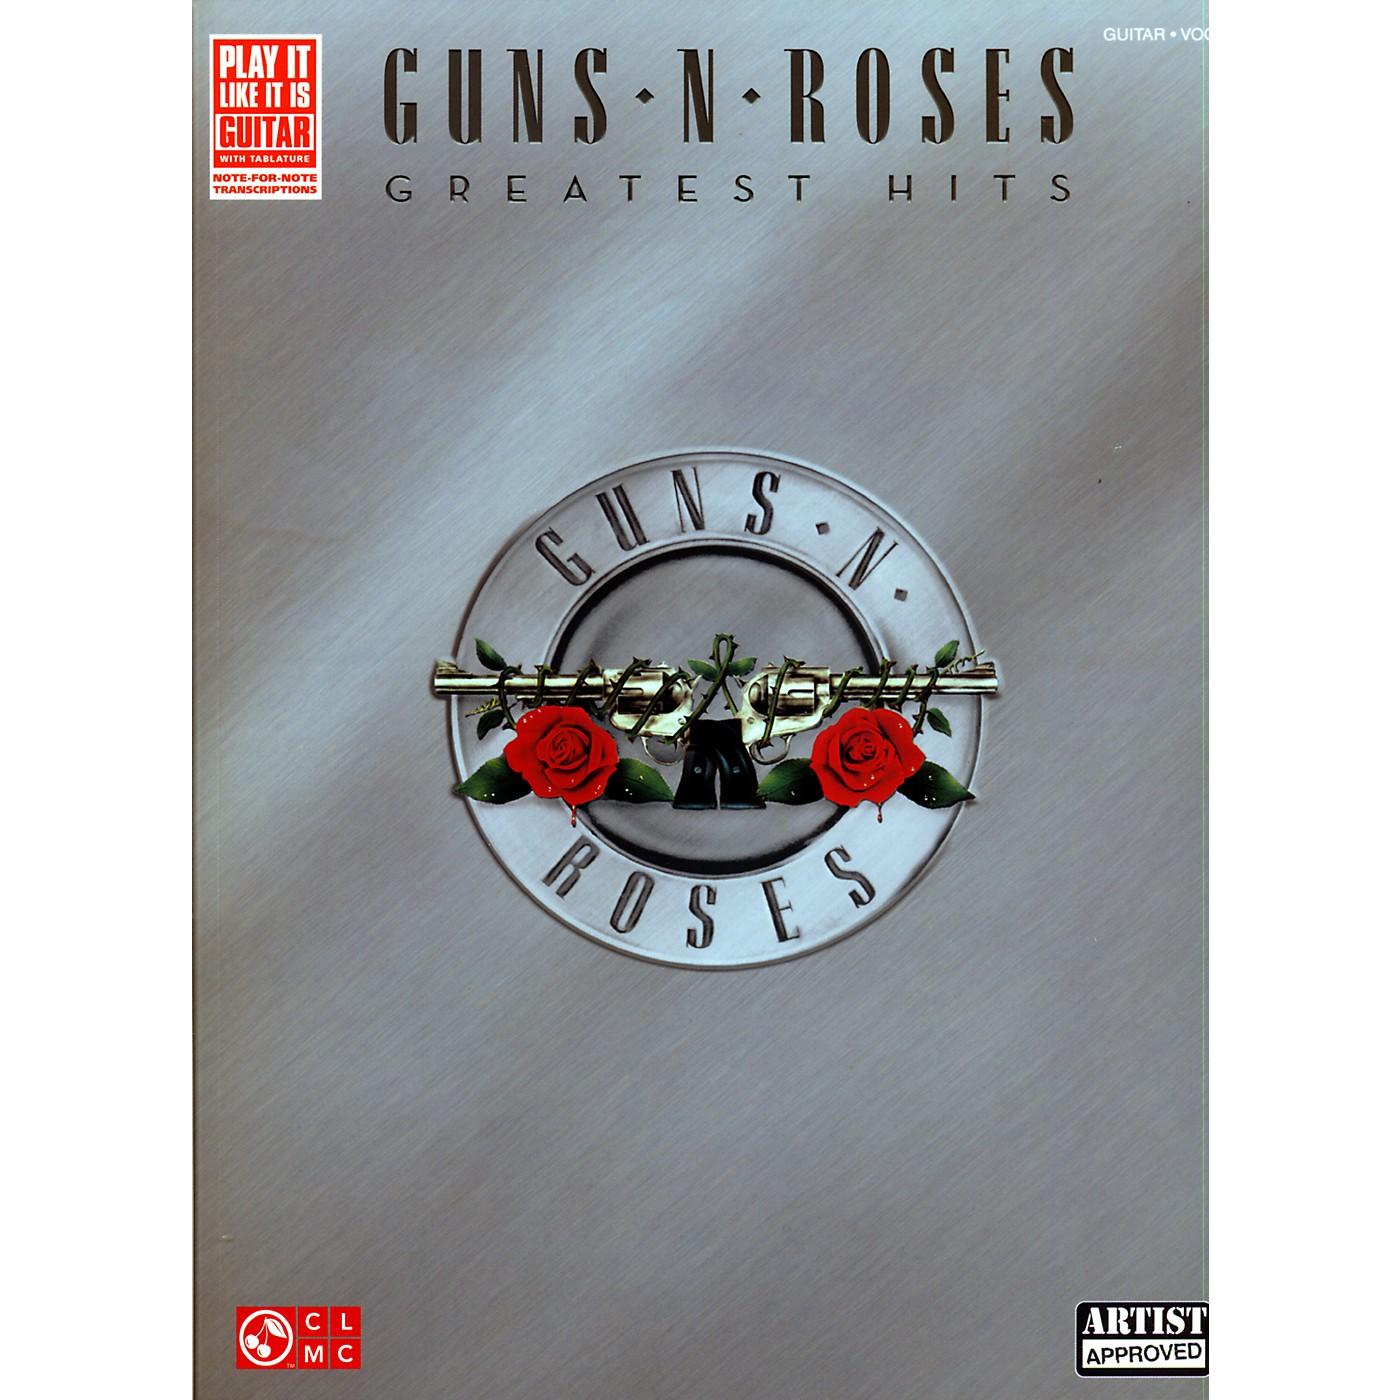 Cherry Lane Guns N' Roses Greatest Hits Guitar Tab Songbook thumbnail